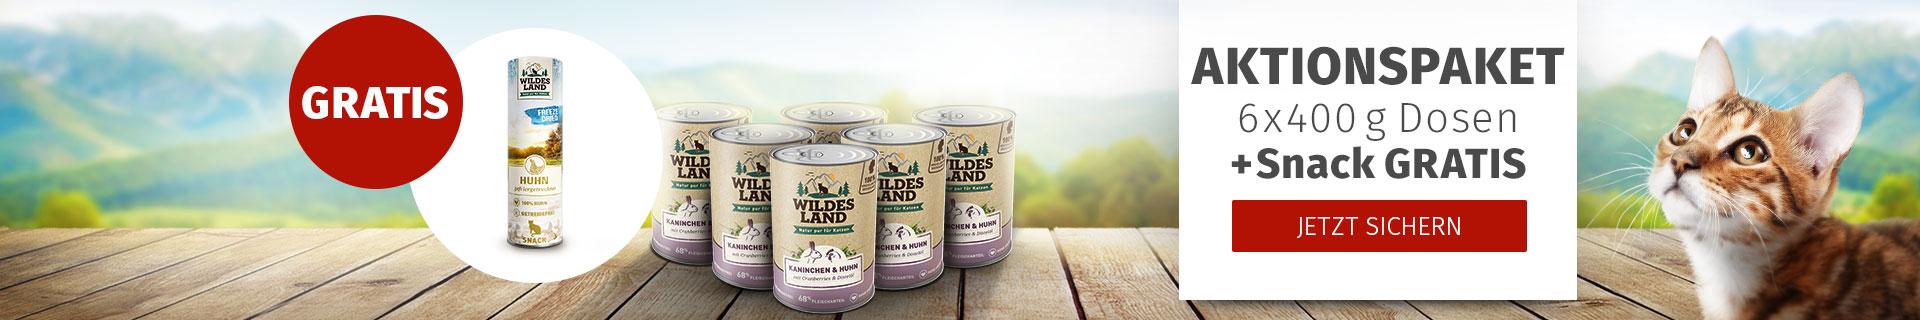 Wildes Land Aktion: 6x400g + Snack gratis